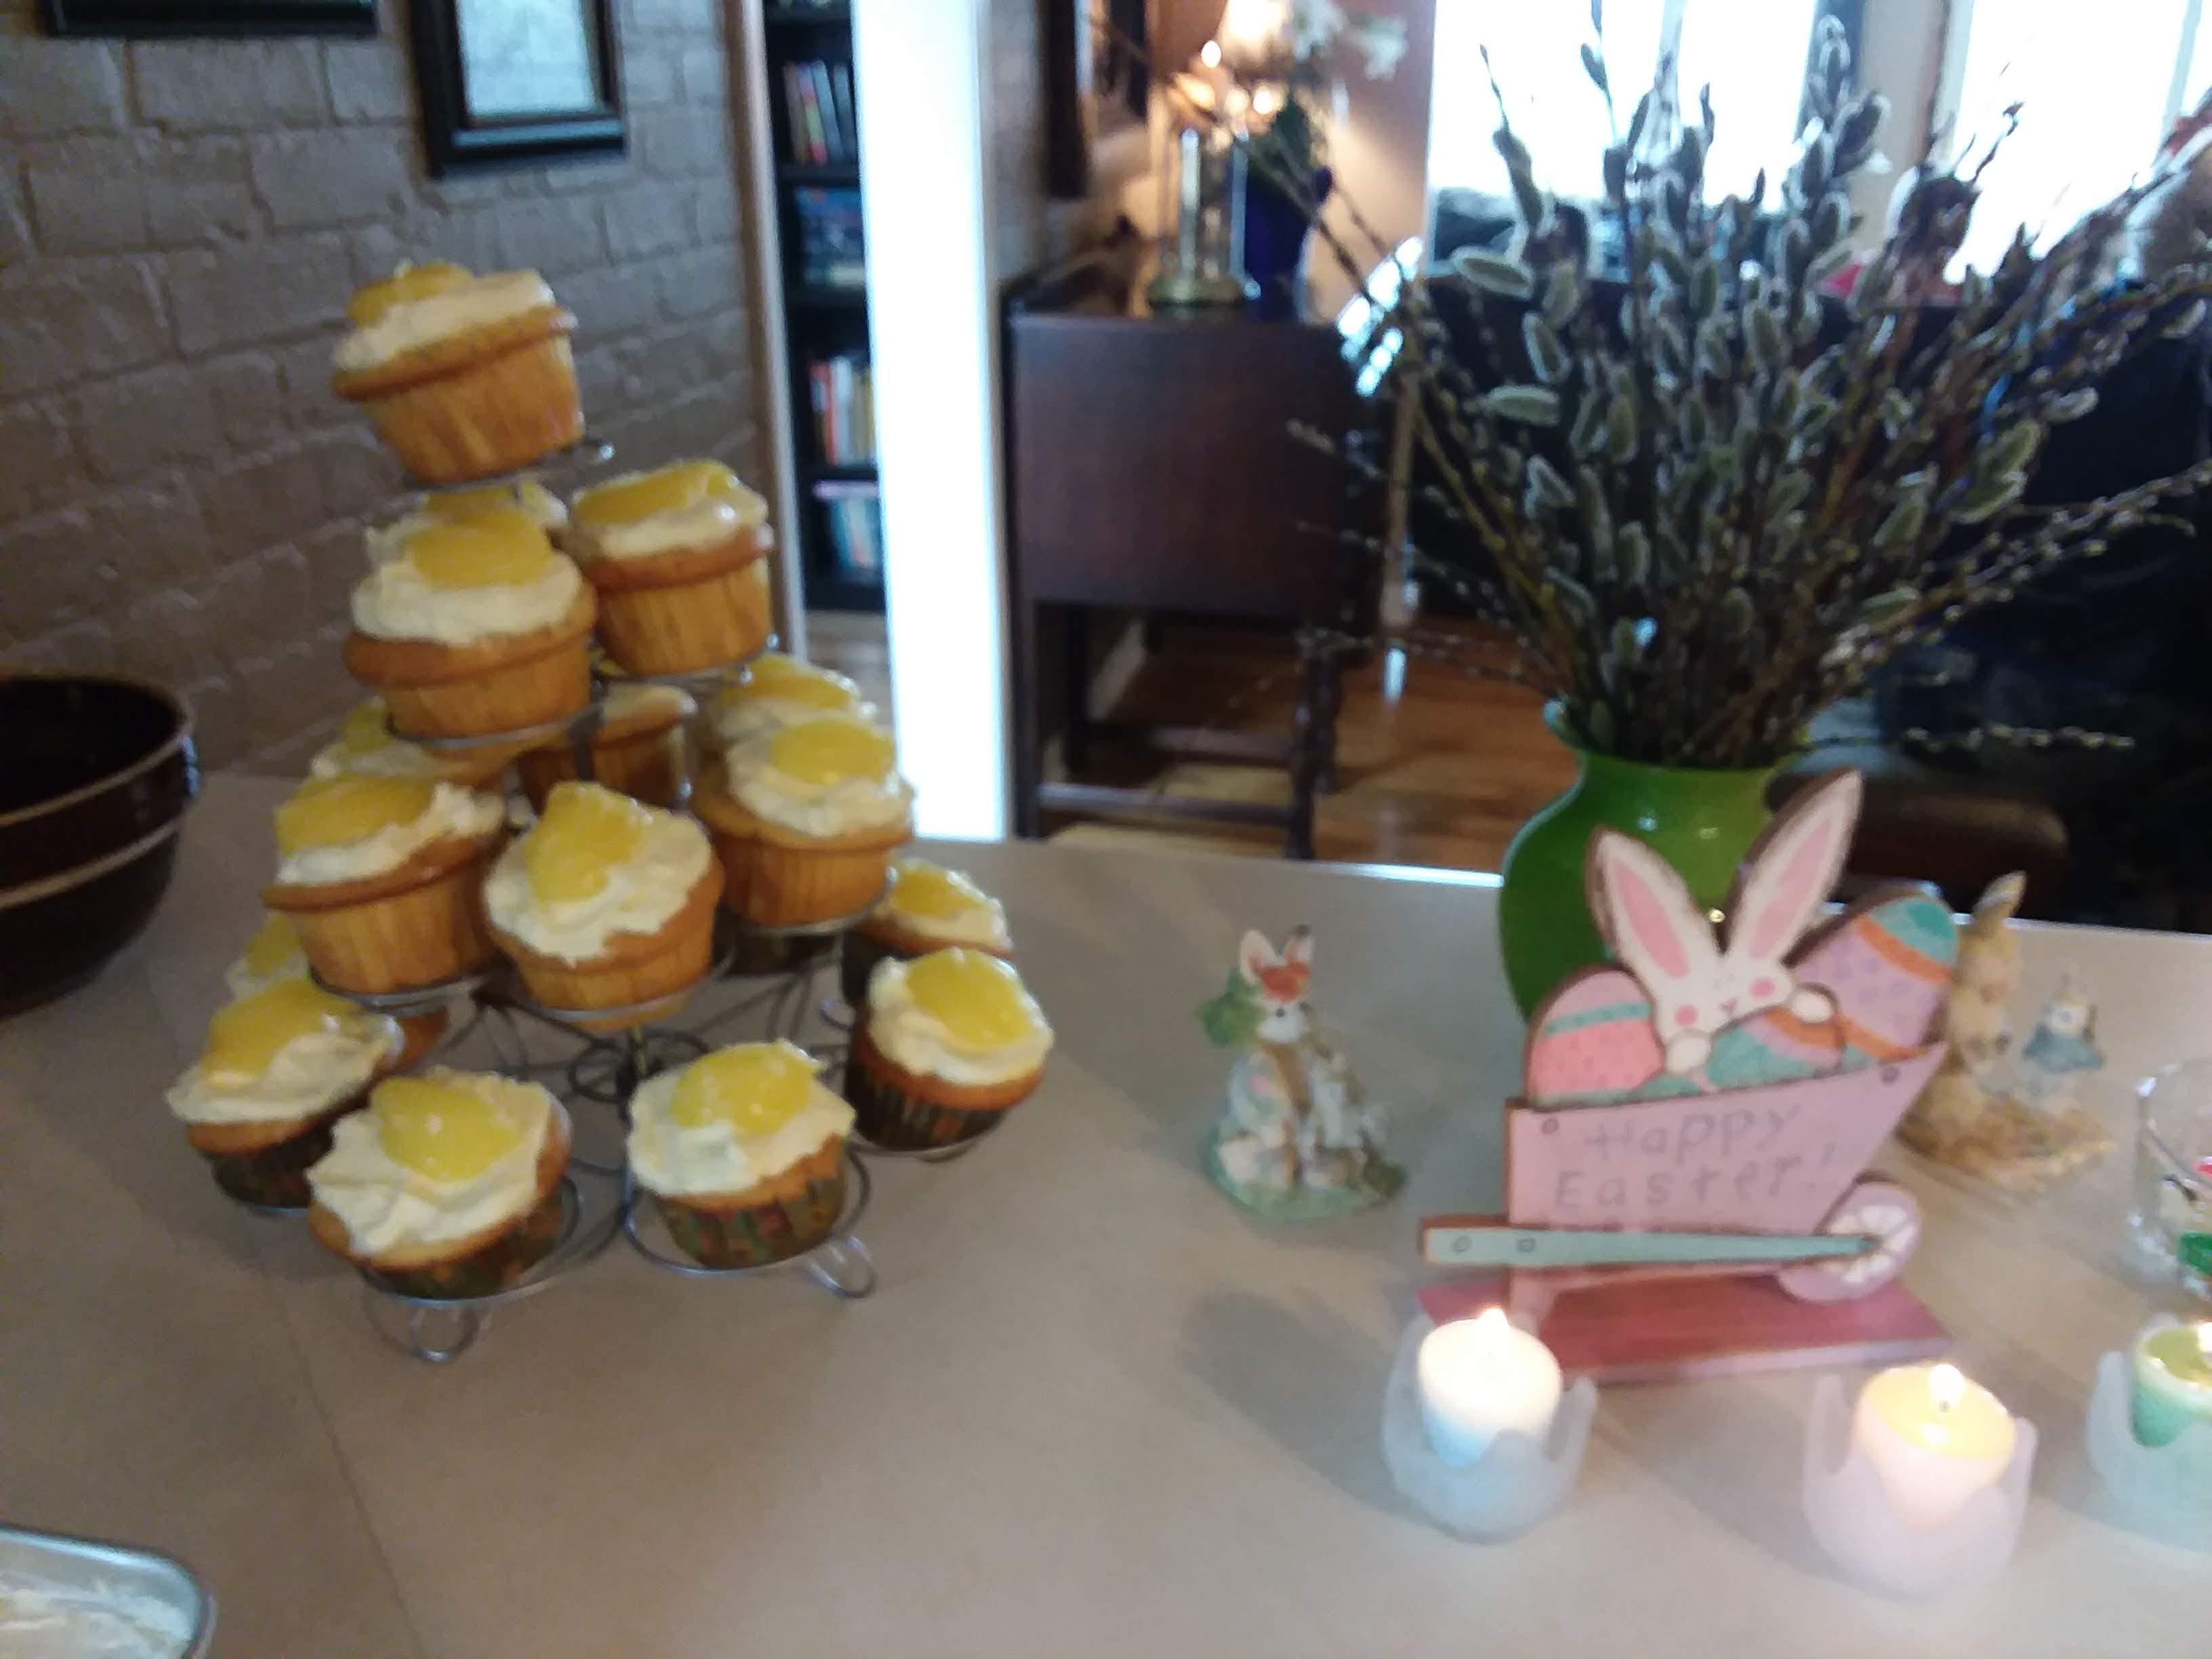 Lemon Poppy Seed Dessert Cake slrybak@yahoo.com